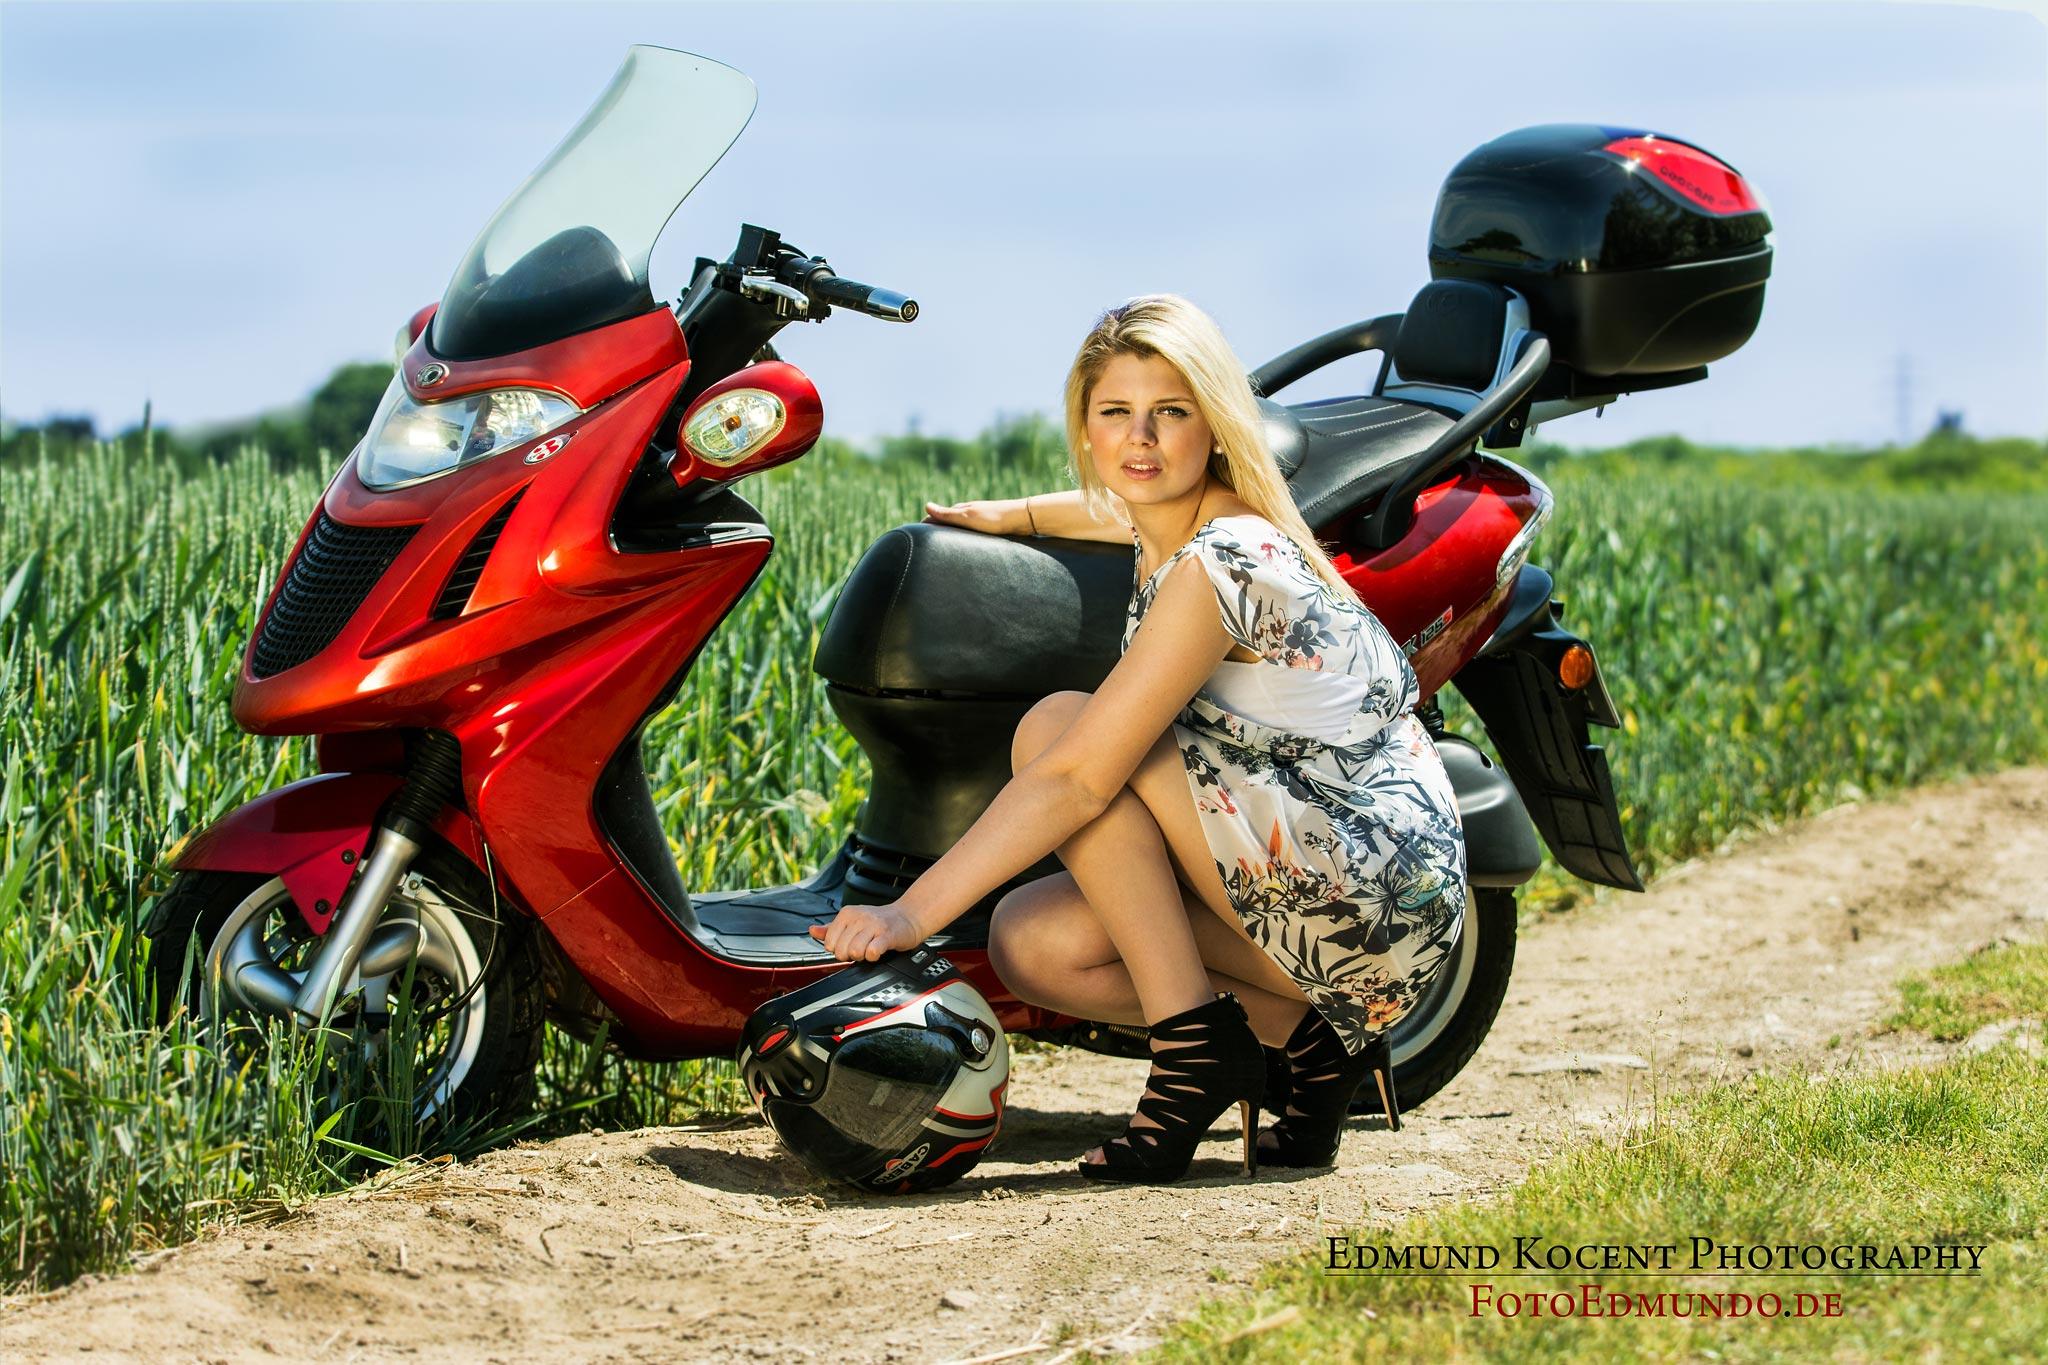 elegante Pose blonde Frau Motorroller FotoEdmundo